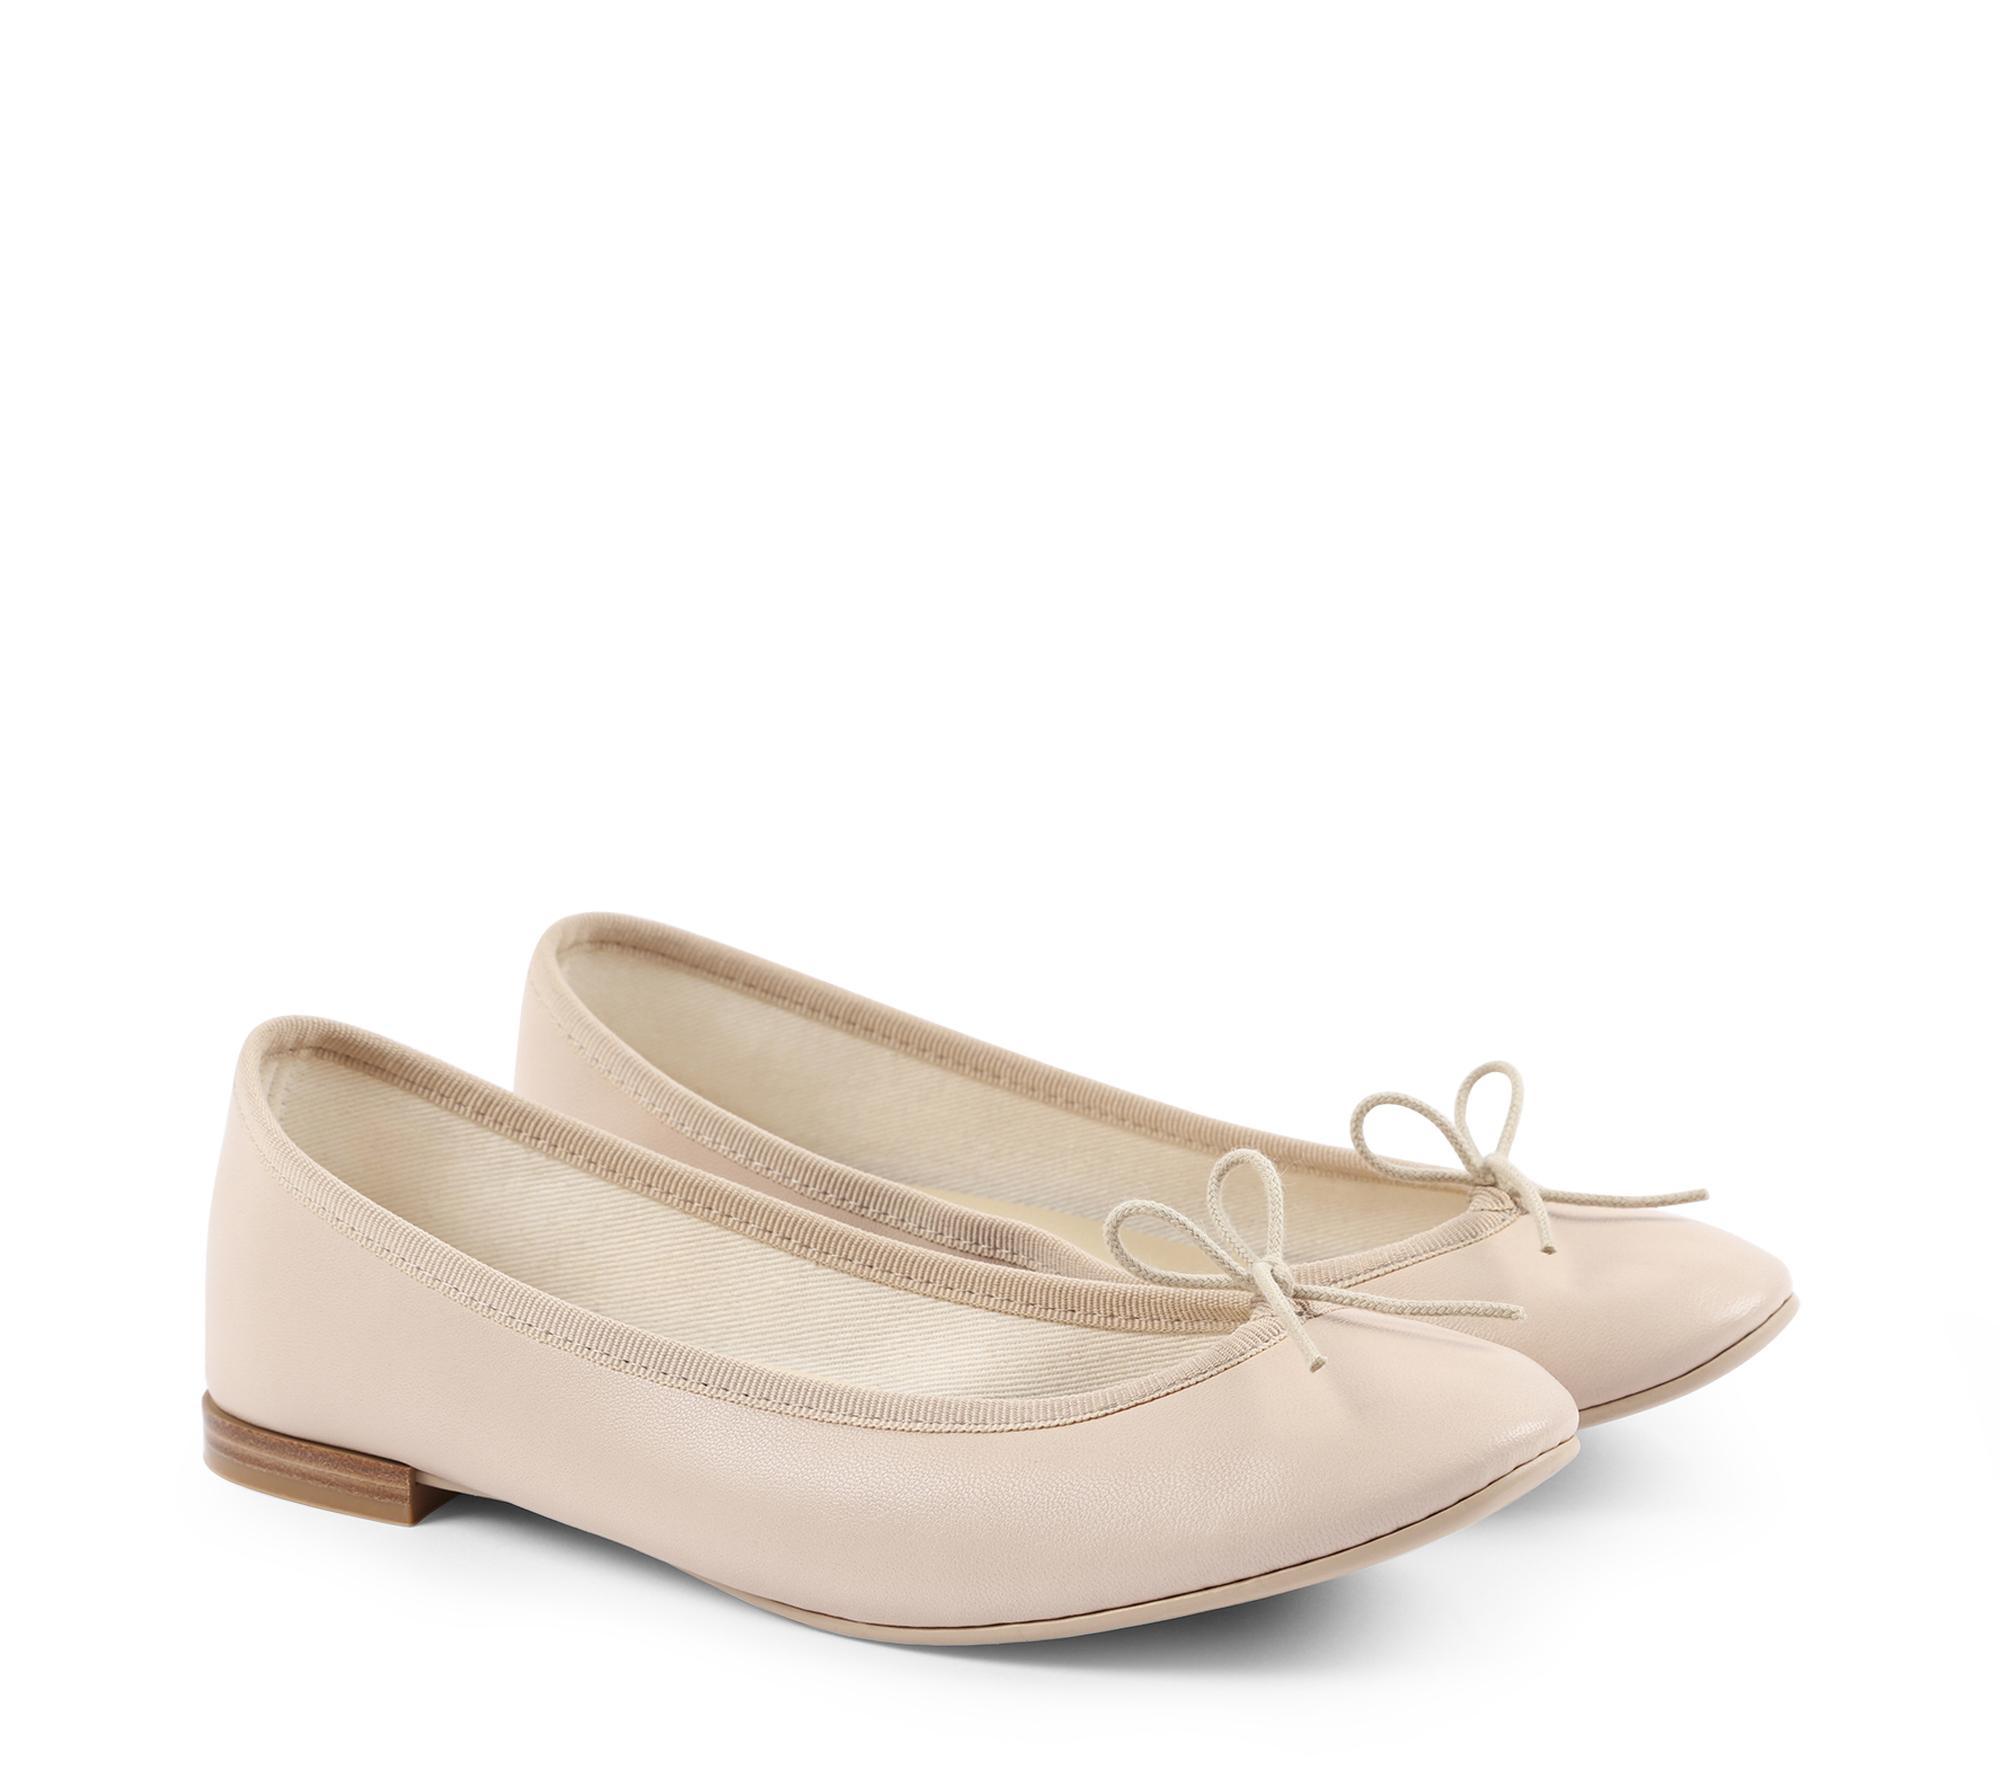 Lili ballerinas